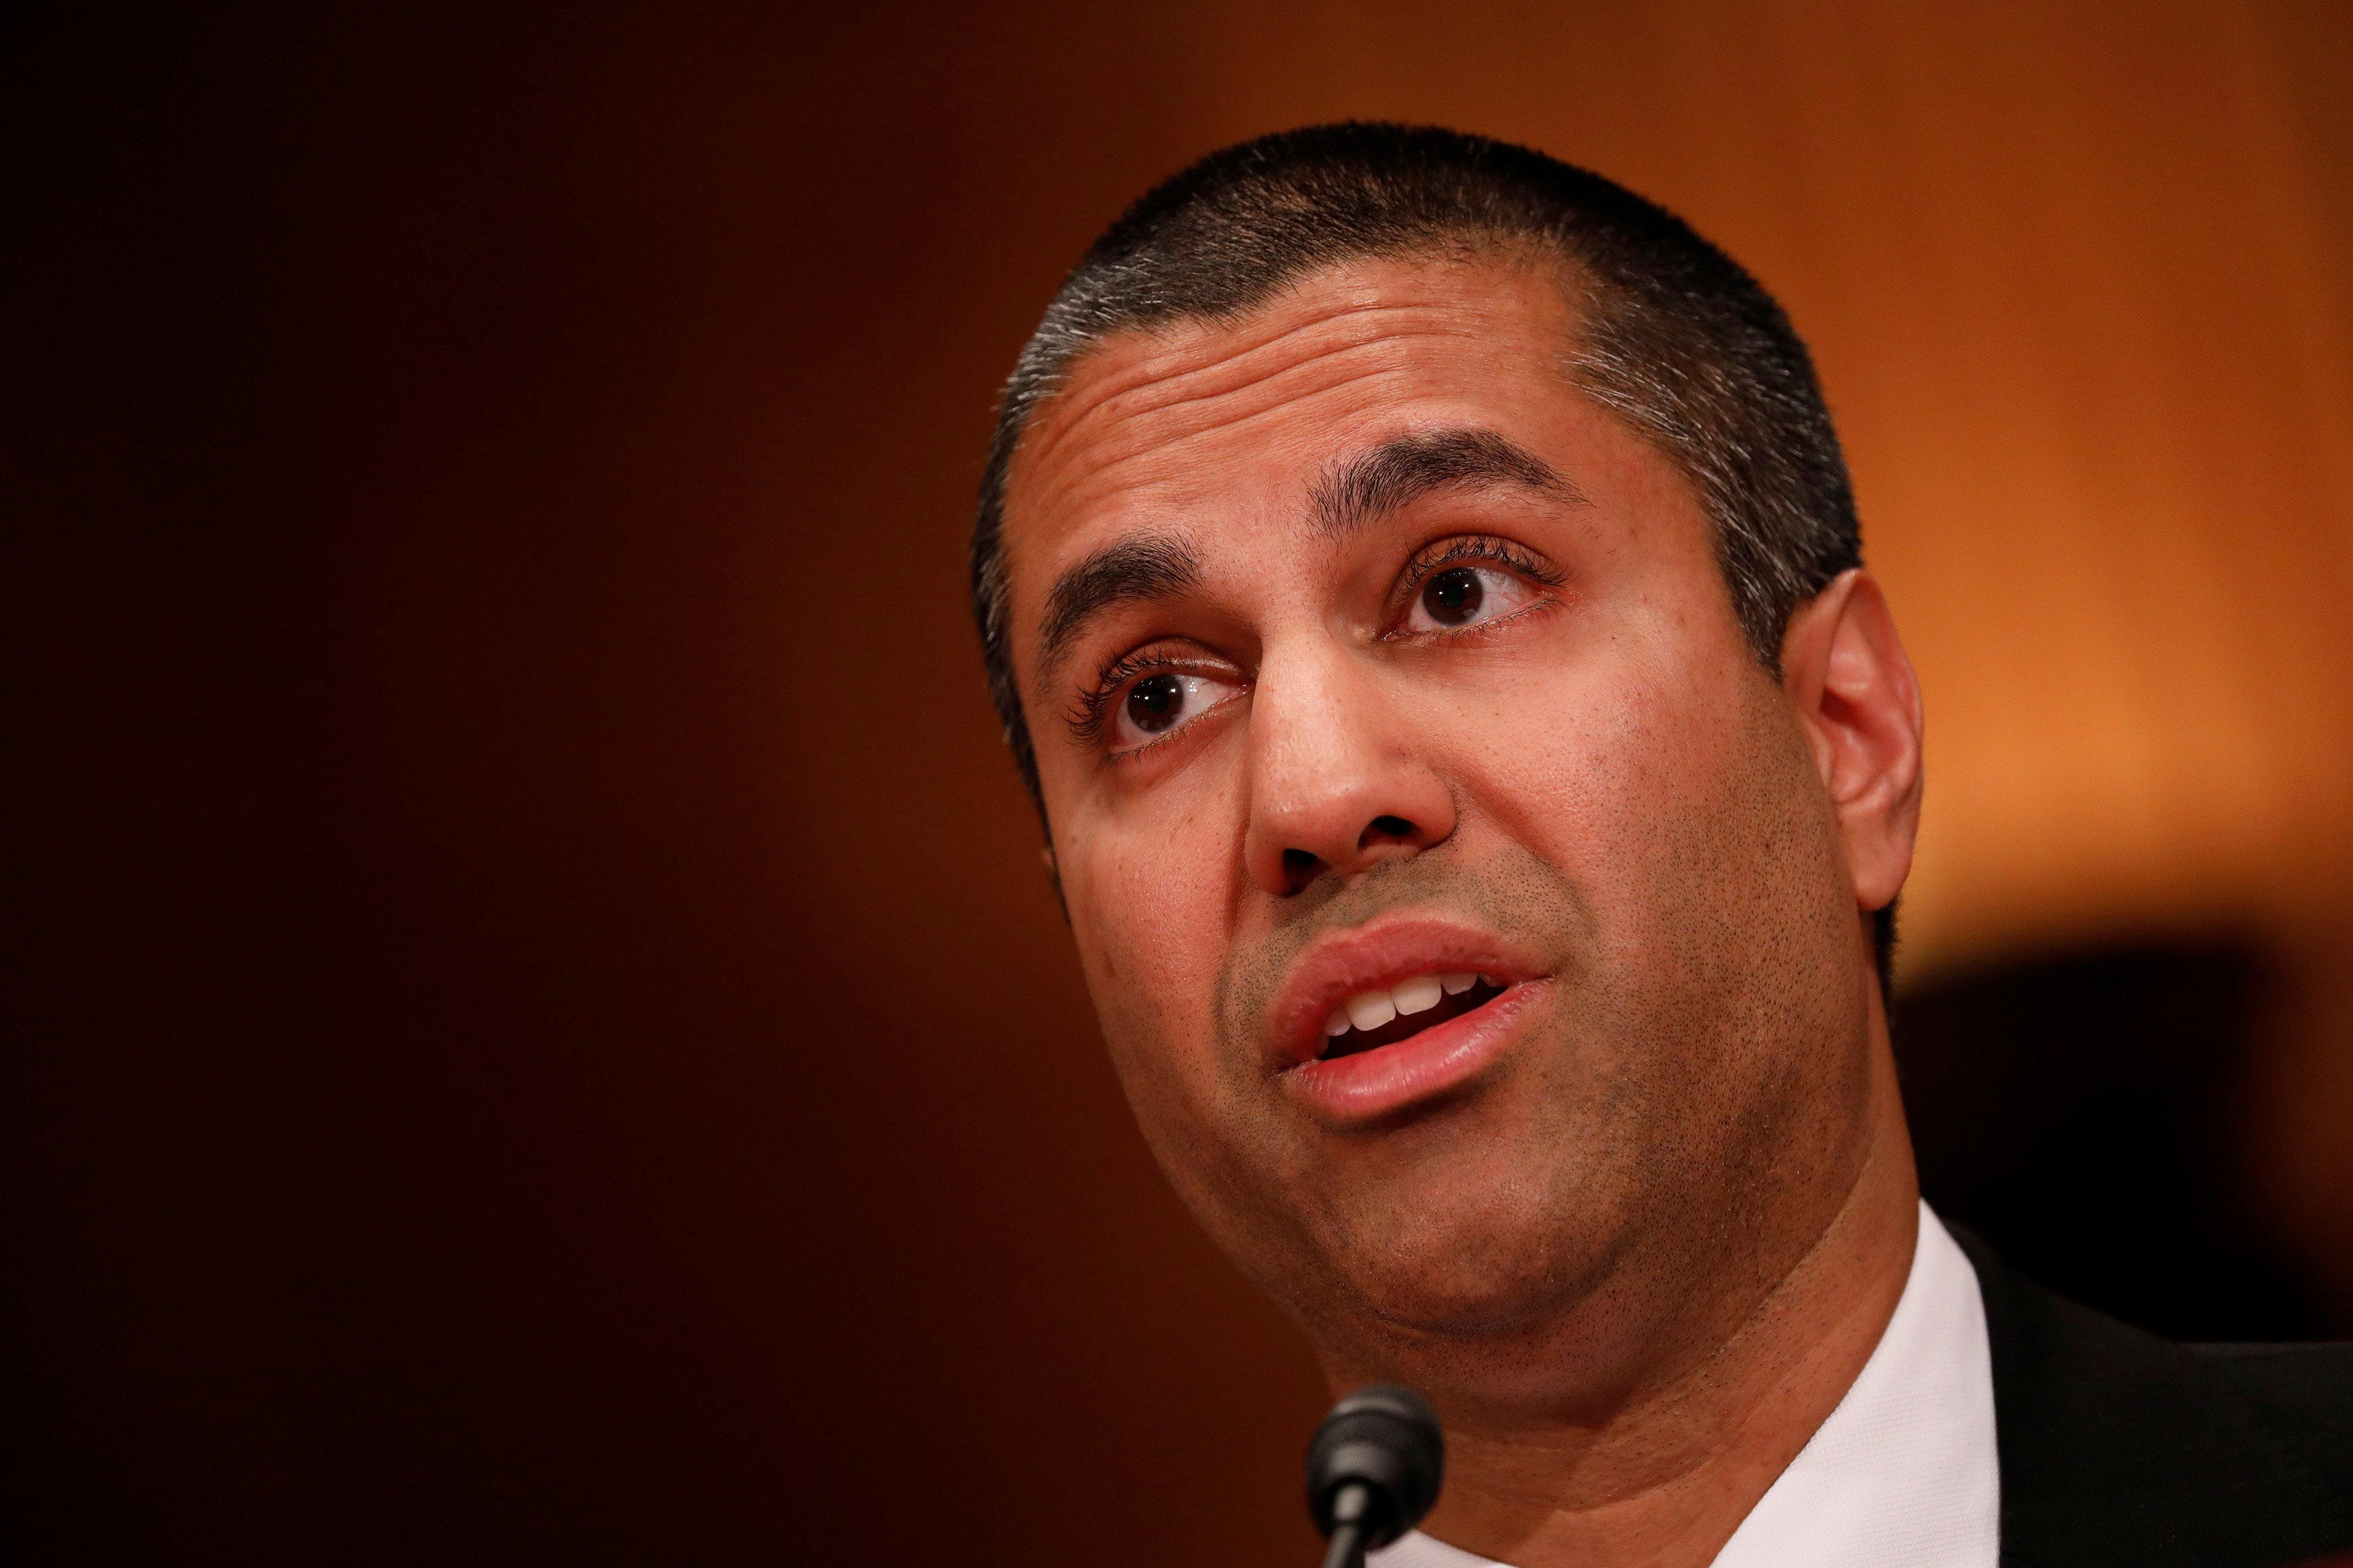 Net Neutrality Can Still Be